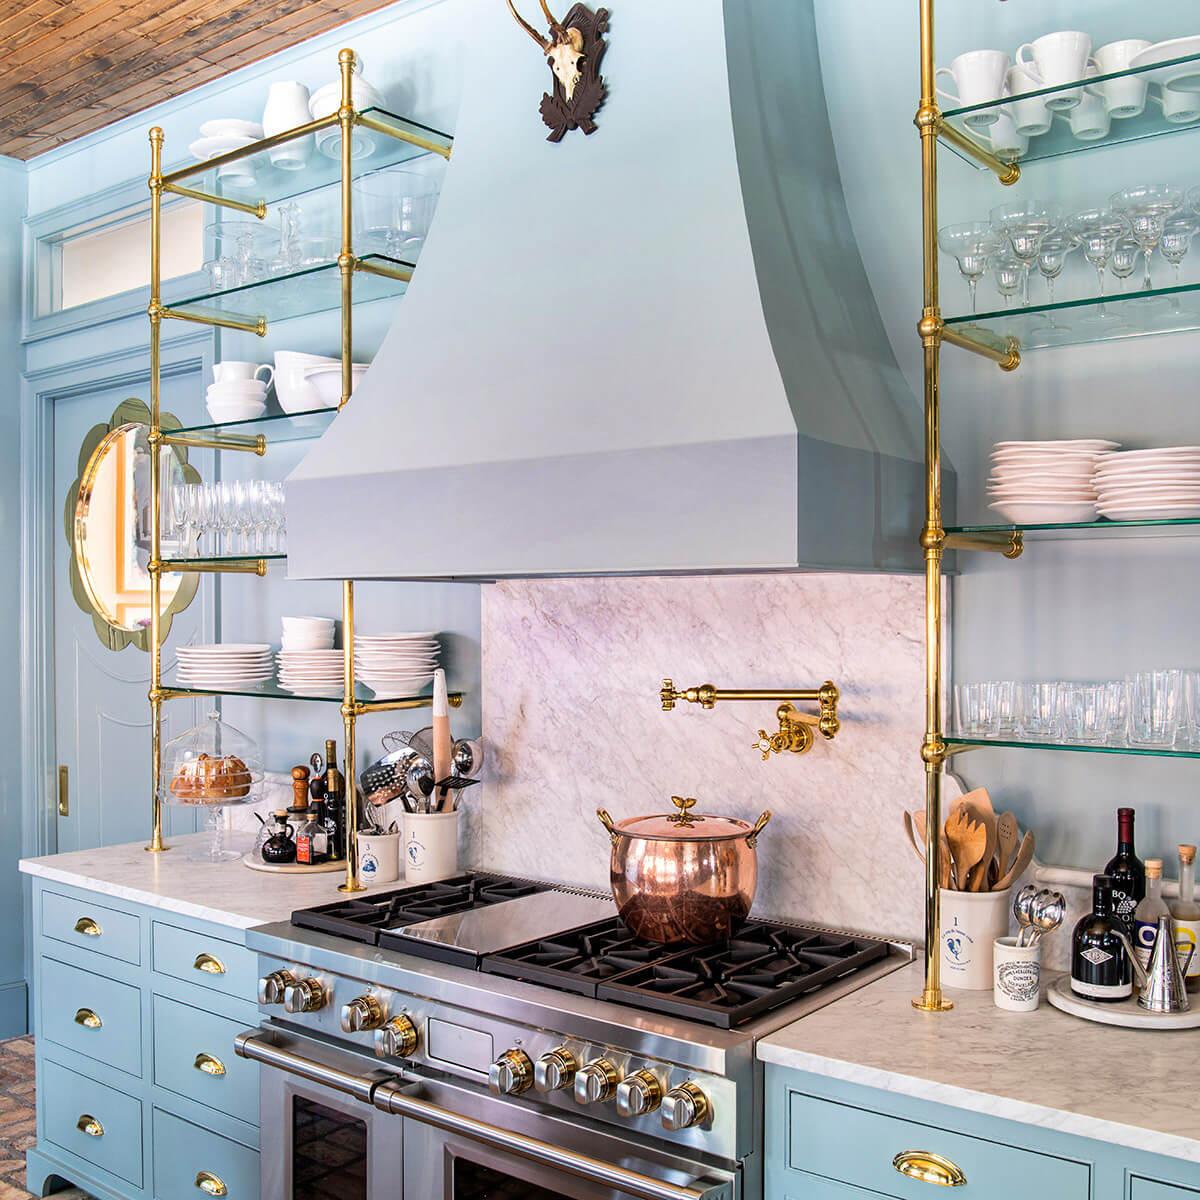 1256-PamWorleyThorenson_Kitchen